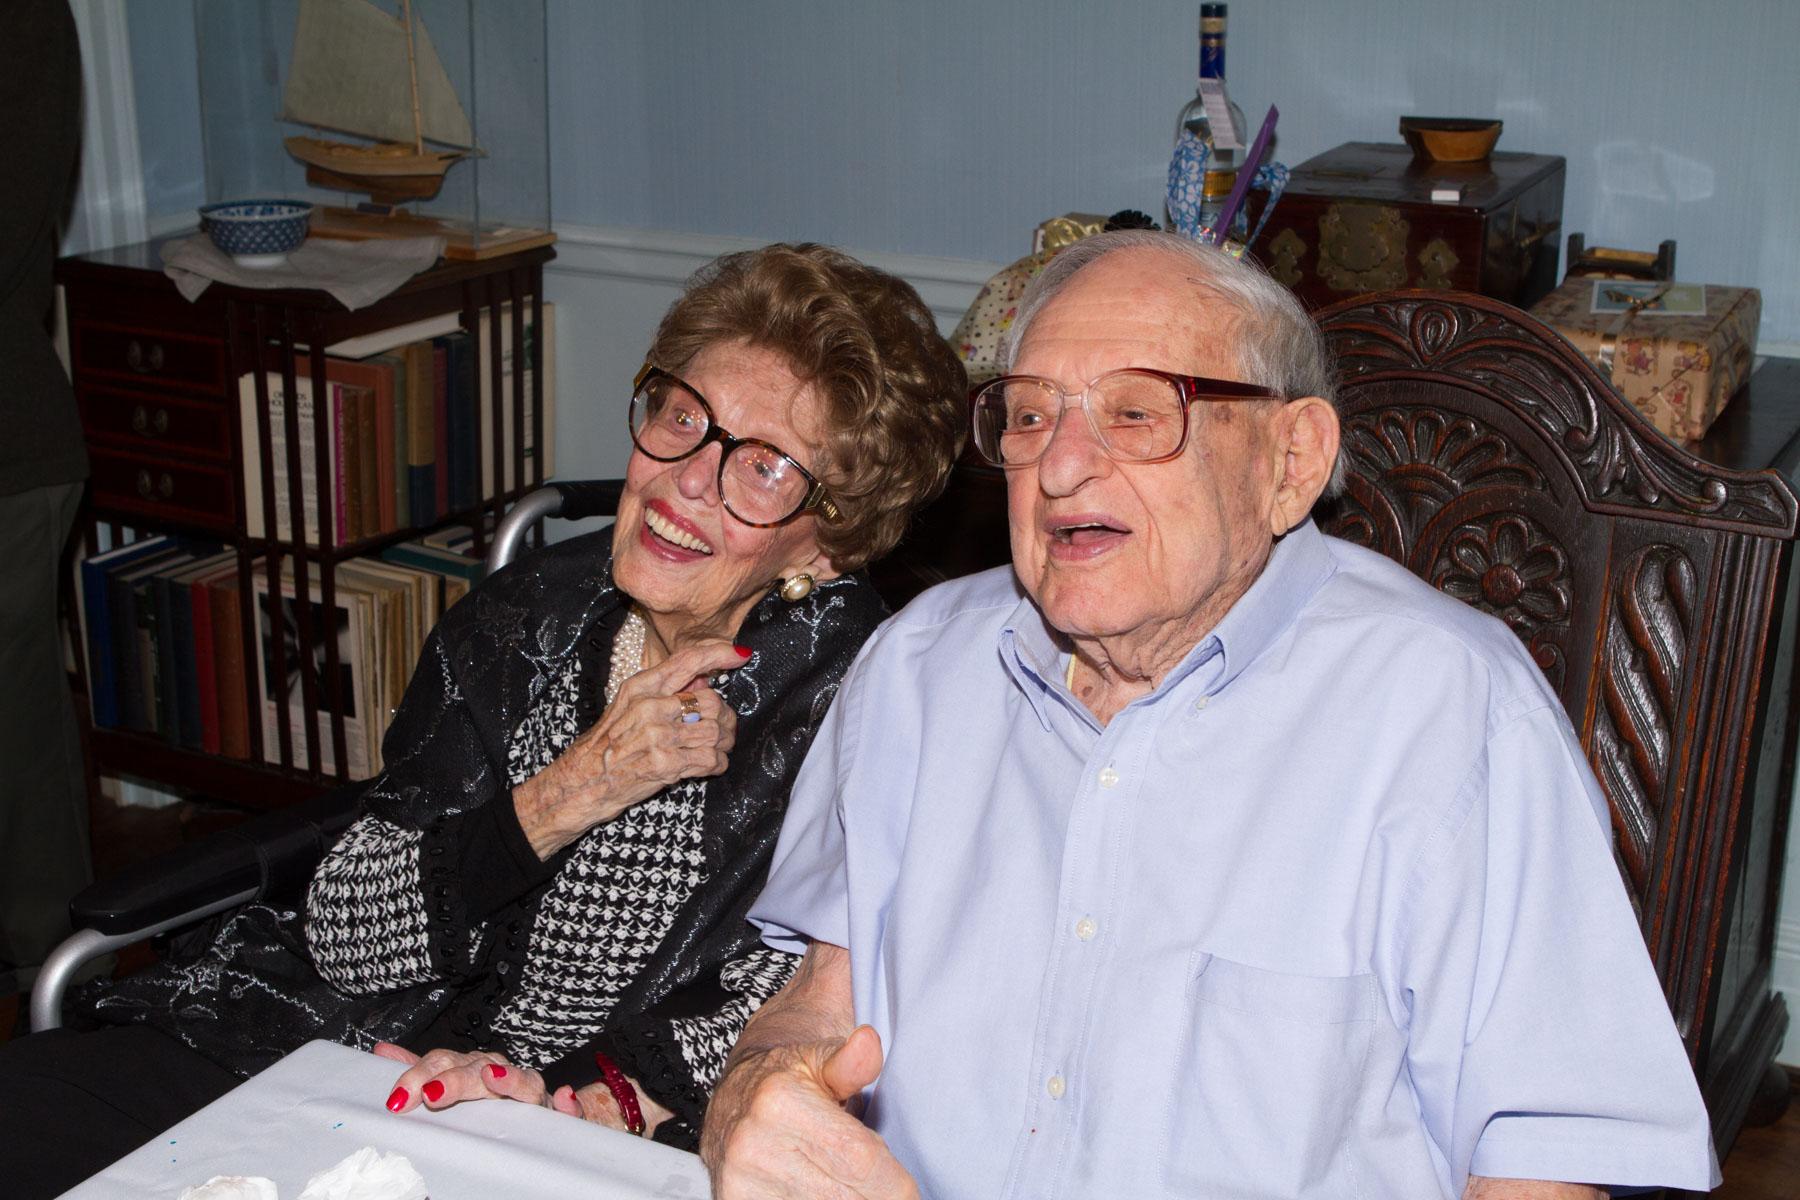 Irving Kahn's 105th birthday